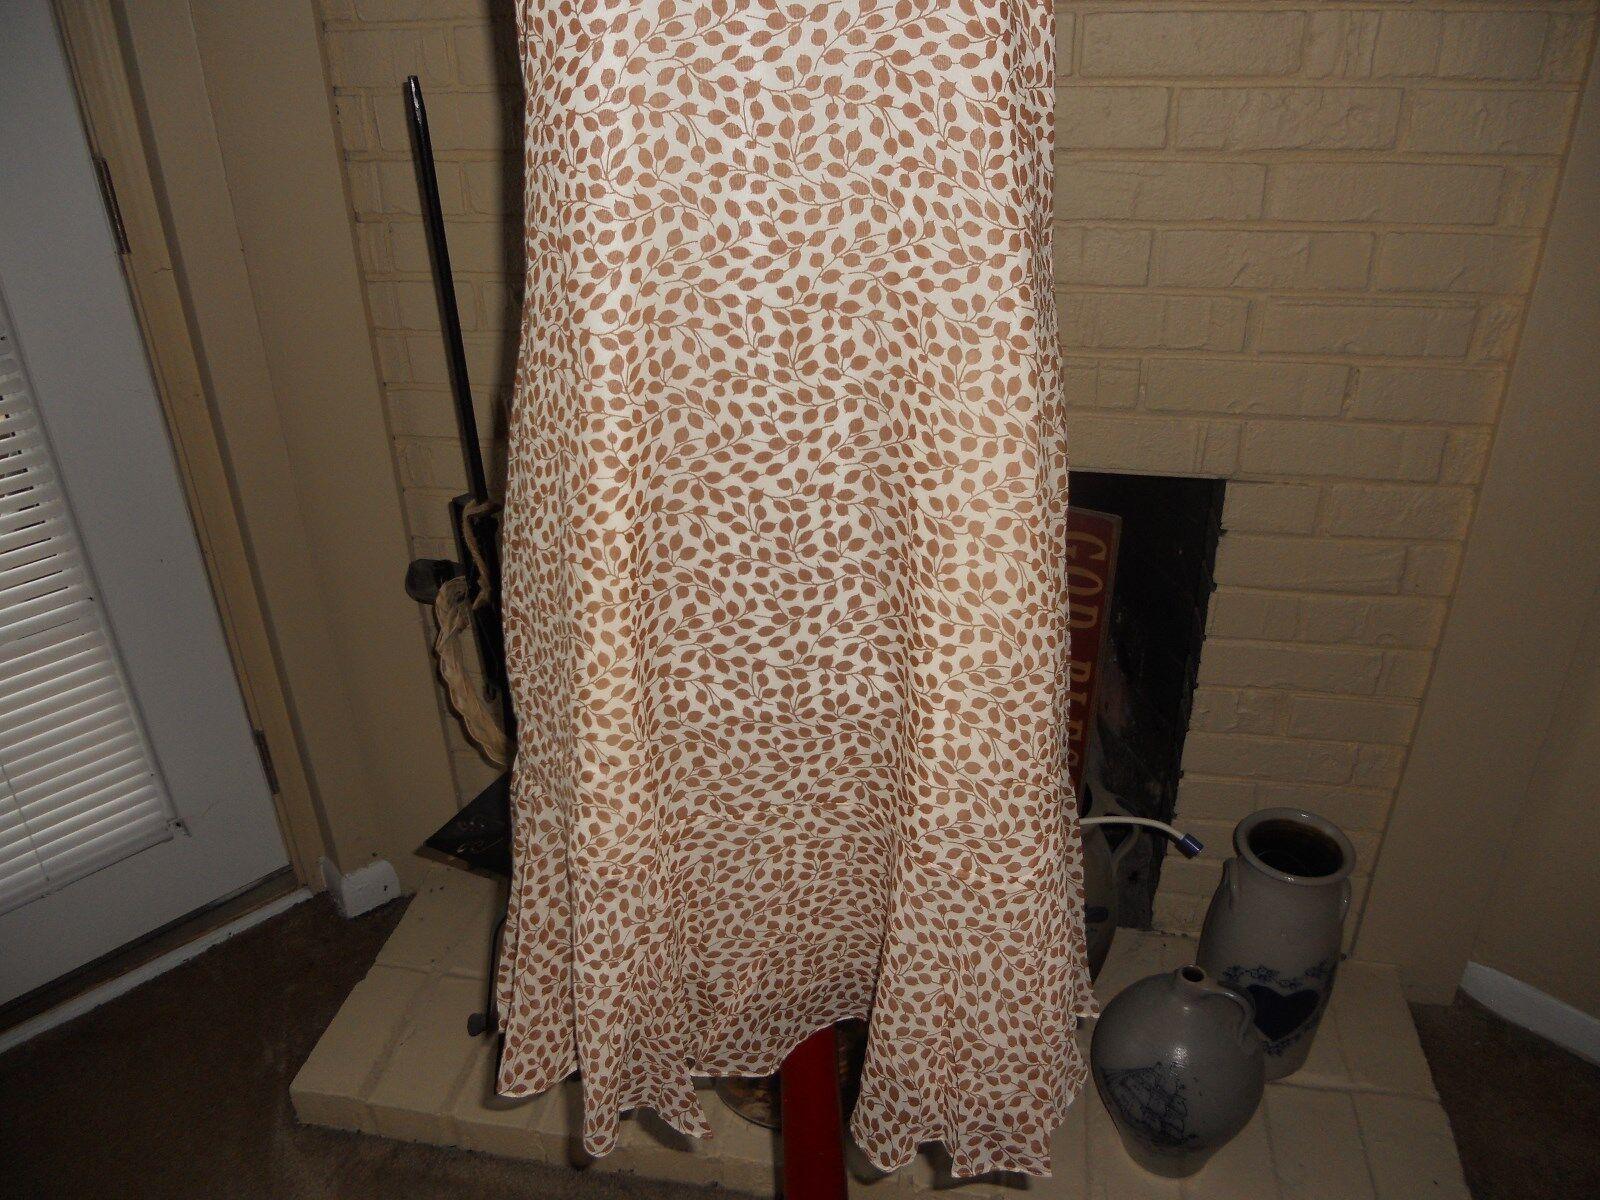 NWT MADEWELL 1937 SILK RUFFLE-HEM TANK DRESS IN IN IN LEAF SHADE SIZE SMALL 0307cc